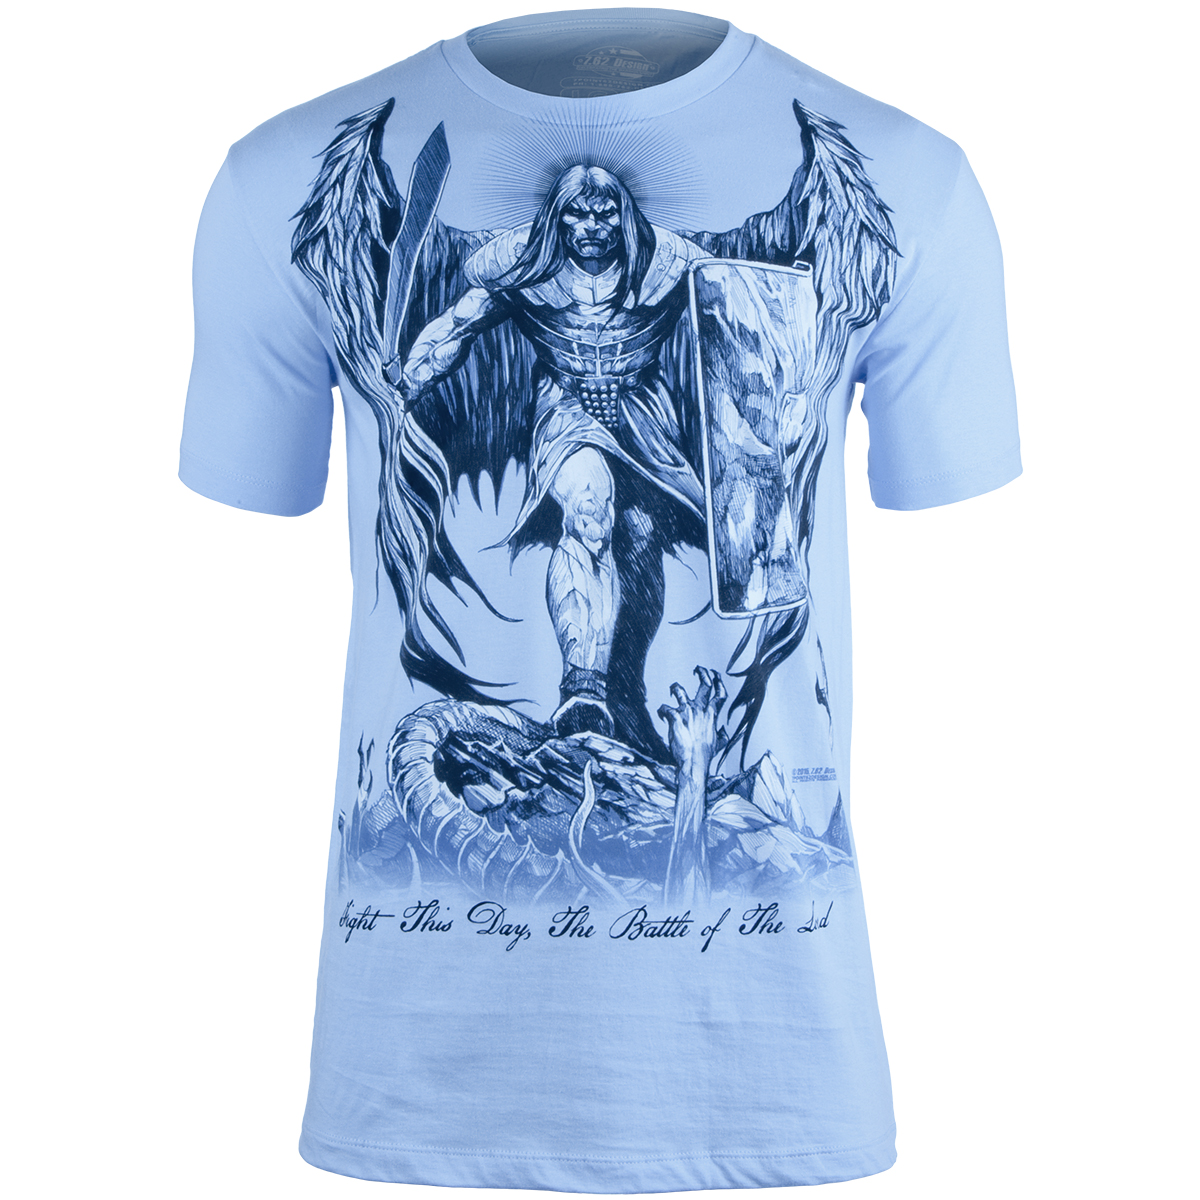 Design t shirt uk - 7 62 Design St Michael Fight This Day T Shirt Light Blue